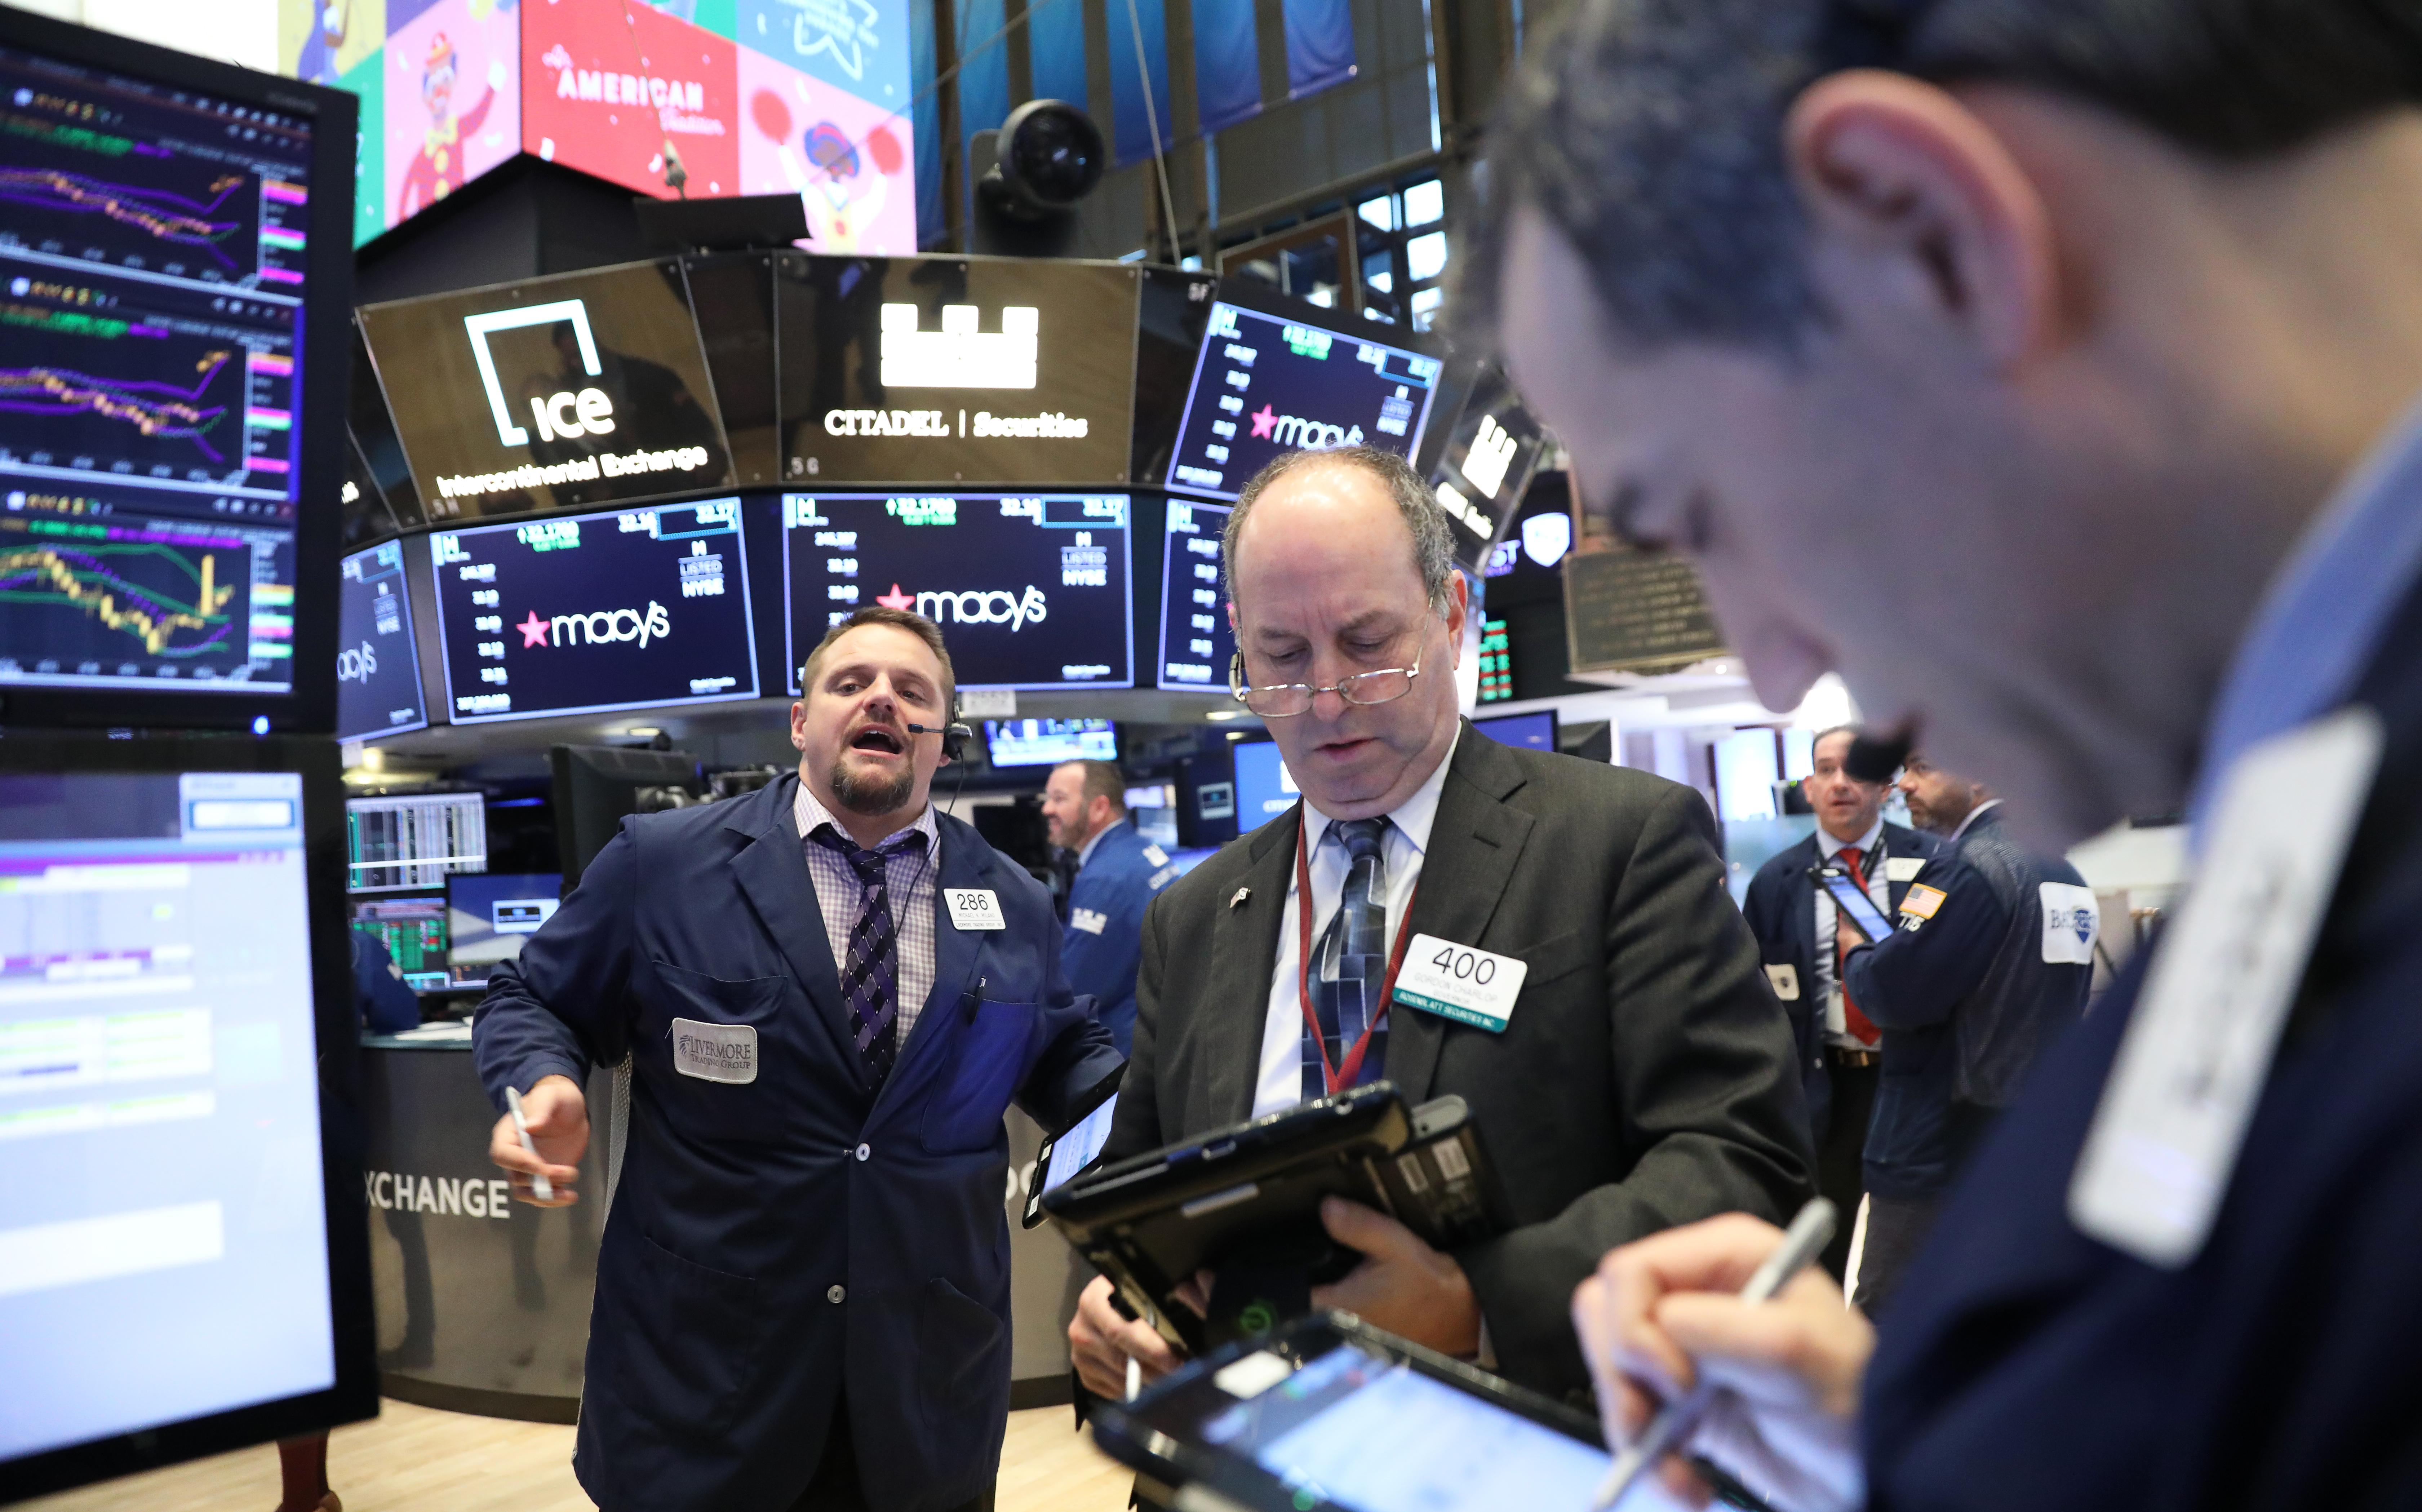 Global markets: technology, energy stocks rally